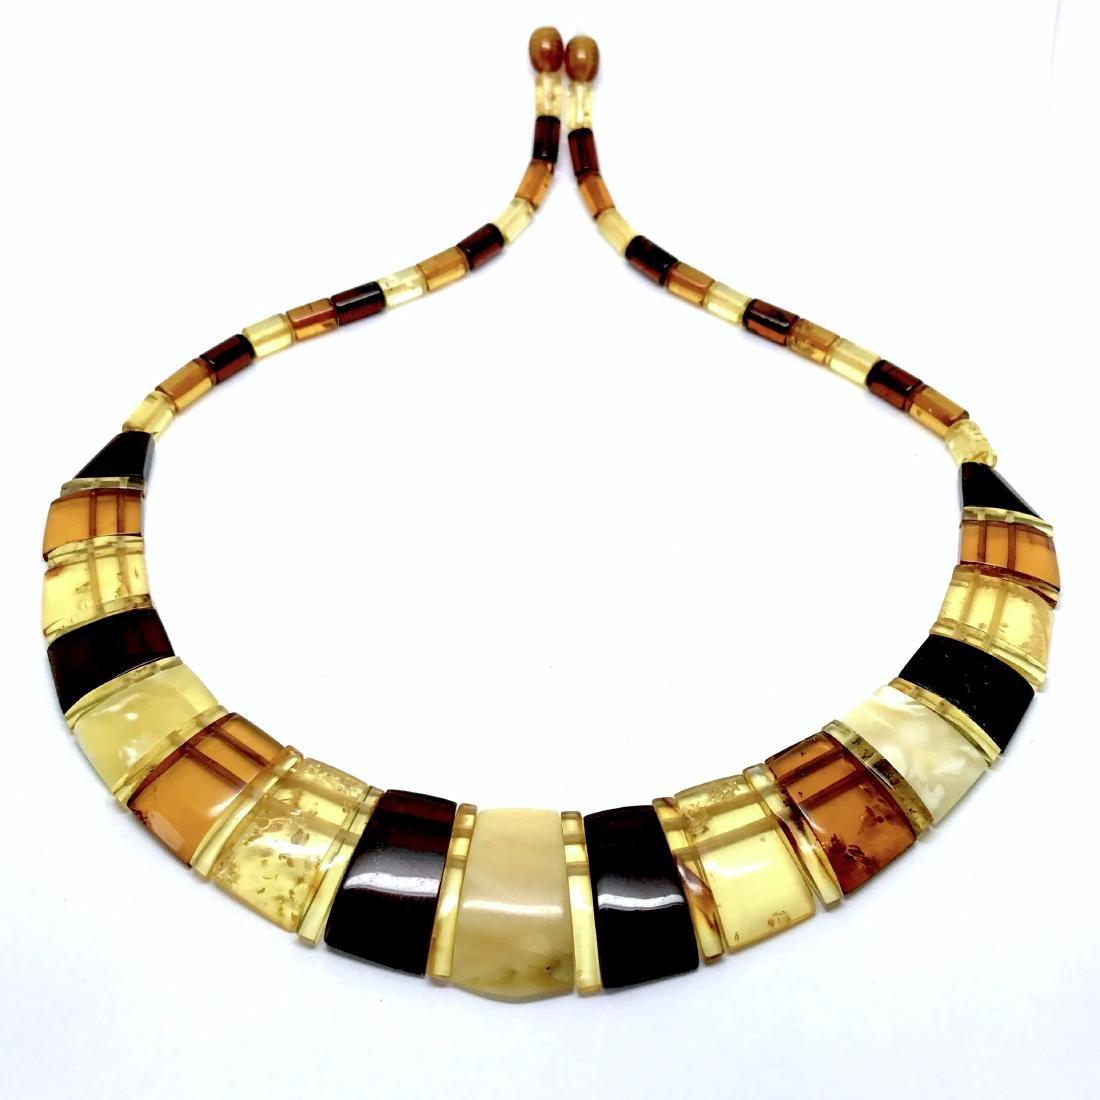 Baltic Amber Necklace Mix Colors (White, Lemon Cherry, - 3